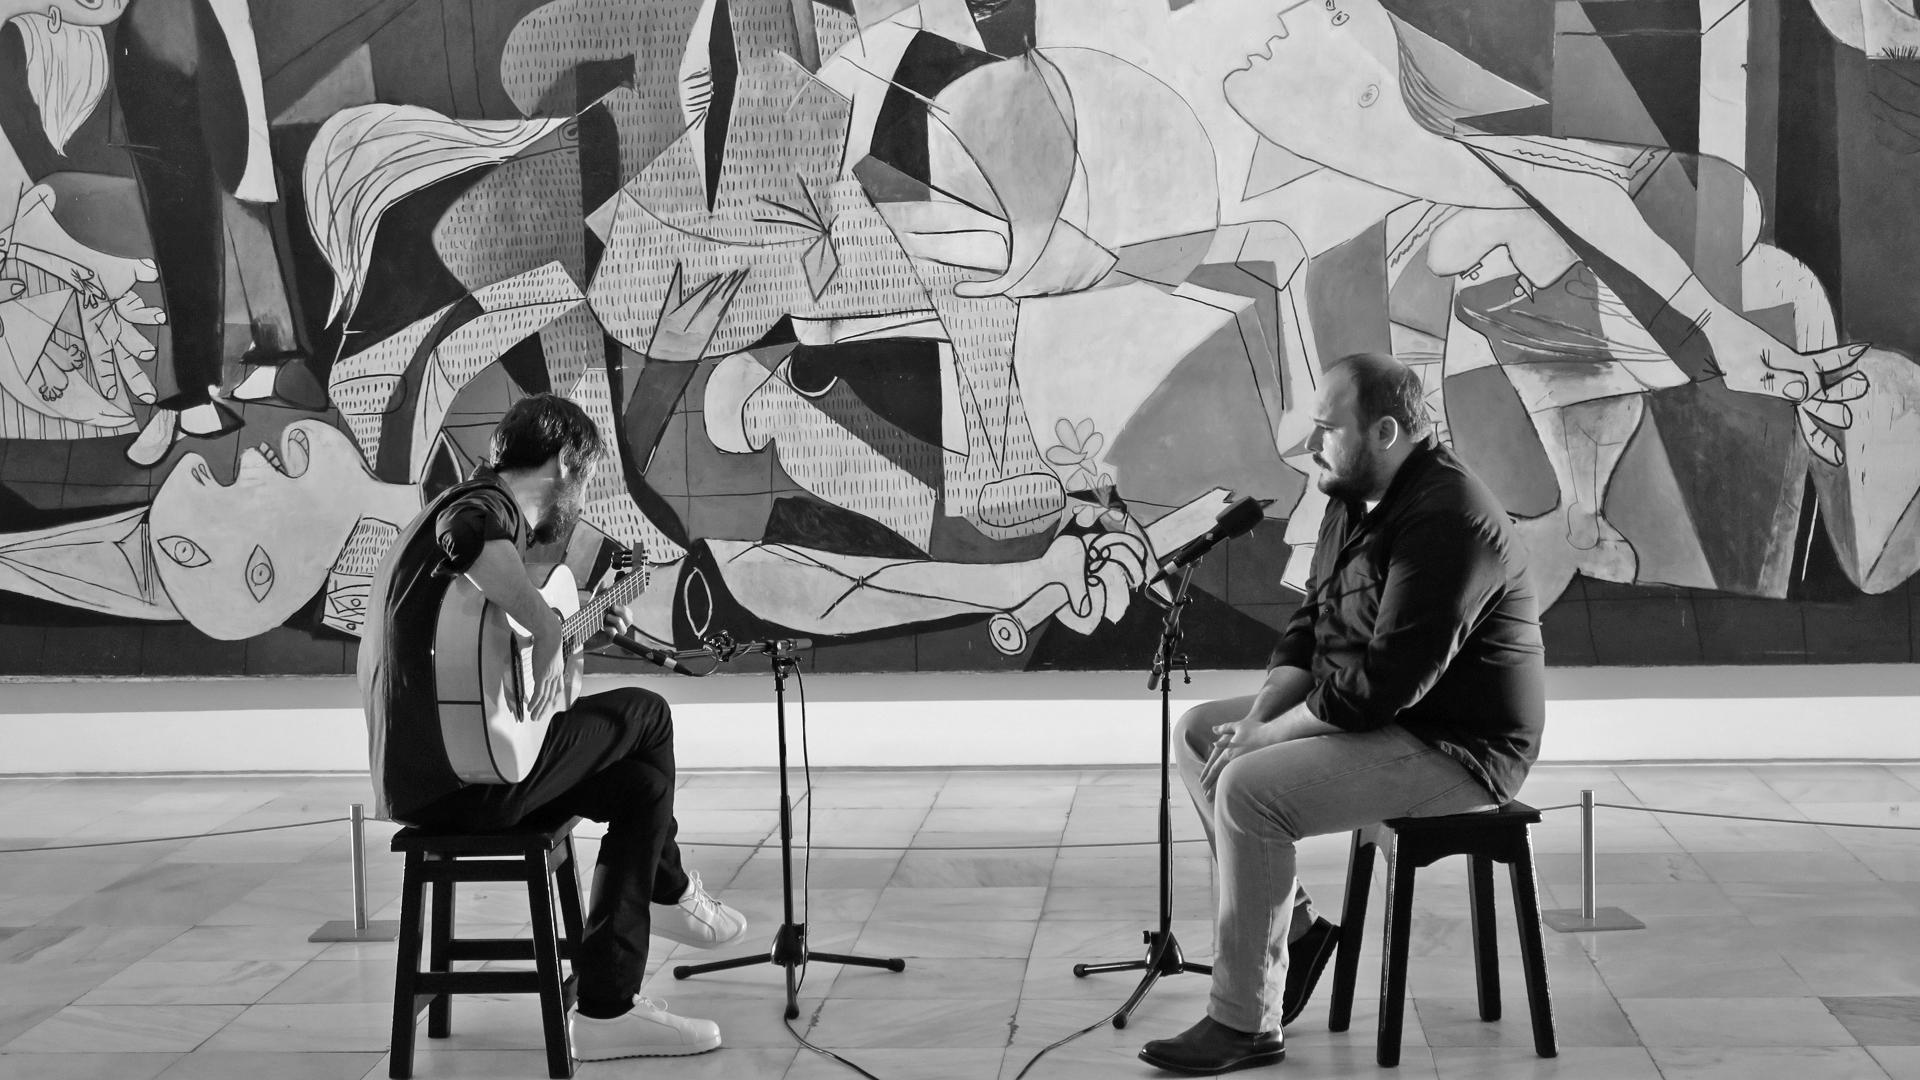 Suena Guernica - Niño de Elche, 'Lekeitio' - 10/05/17